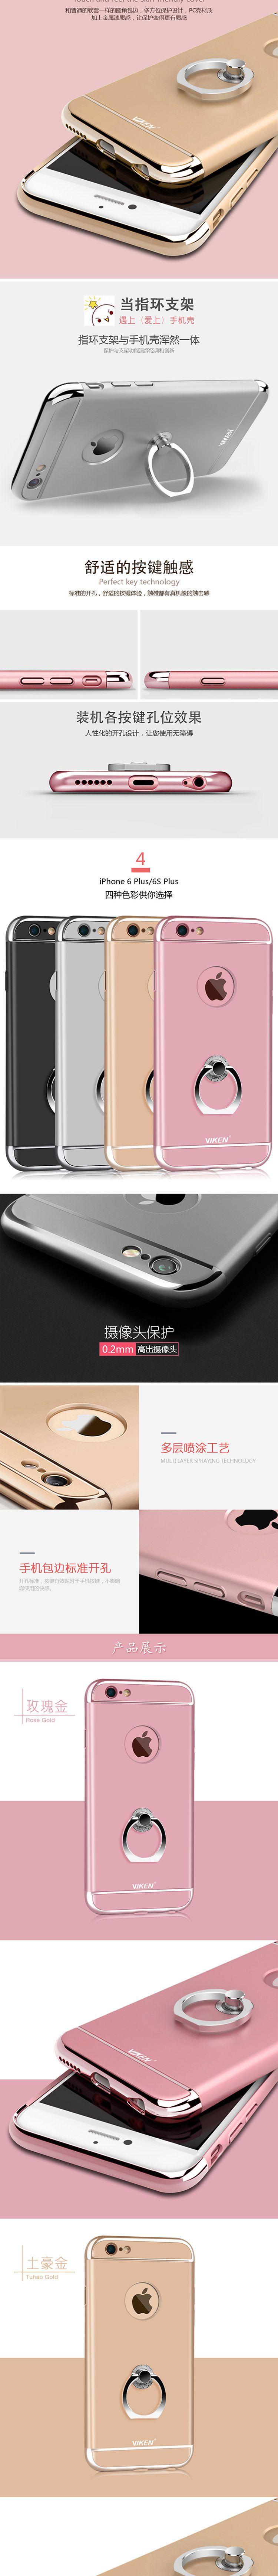 iphone6plus指环三段式 电镀支架 硬壳图片